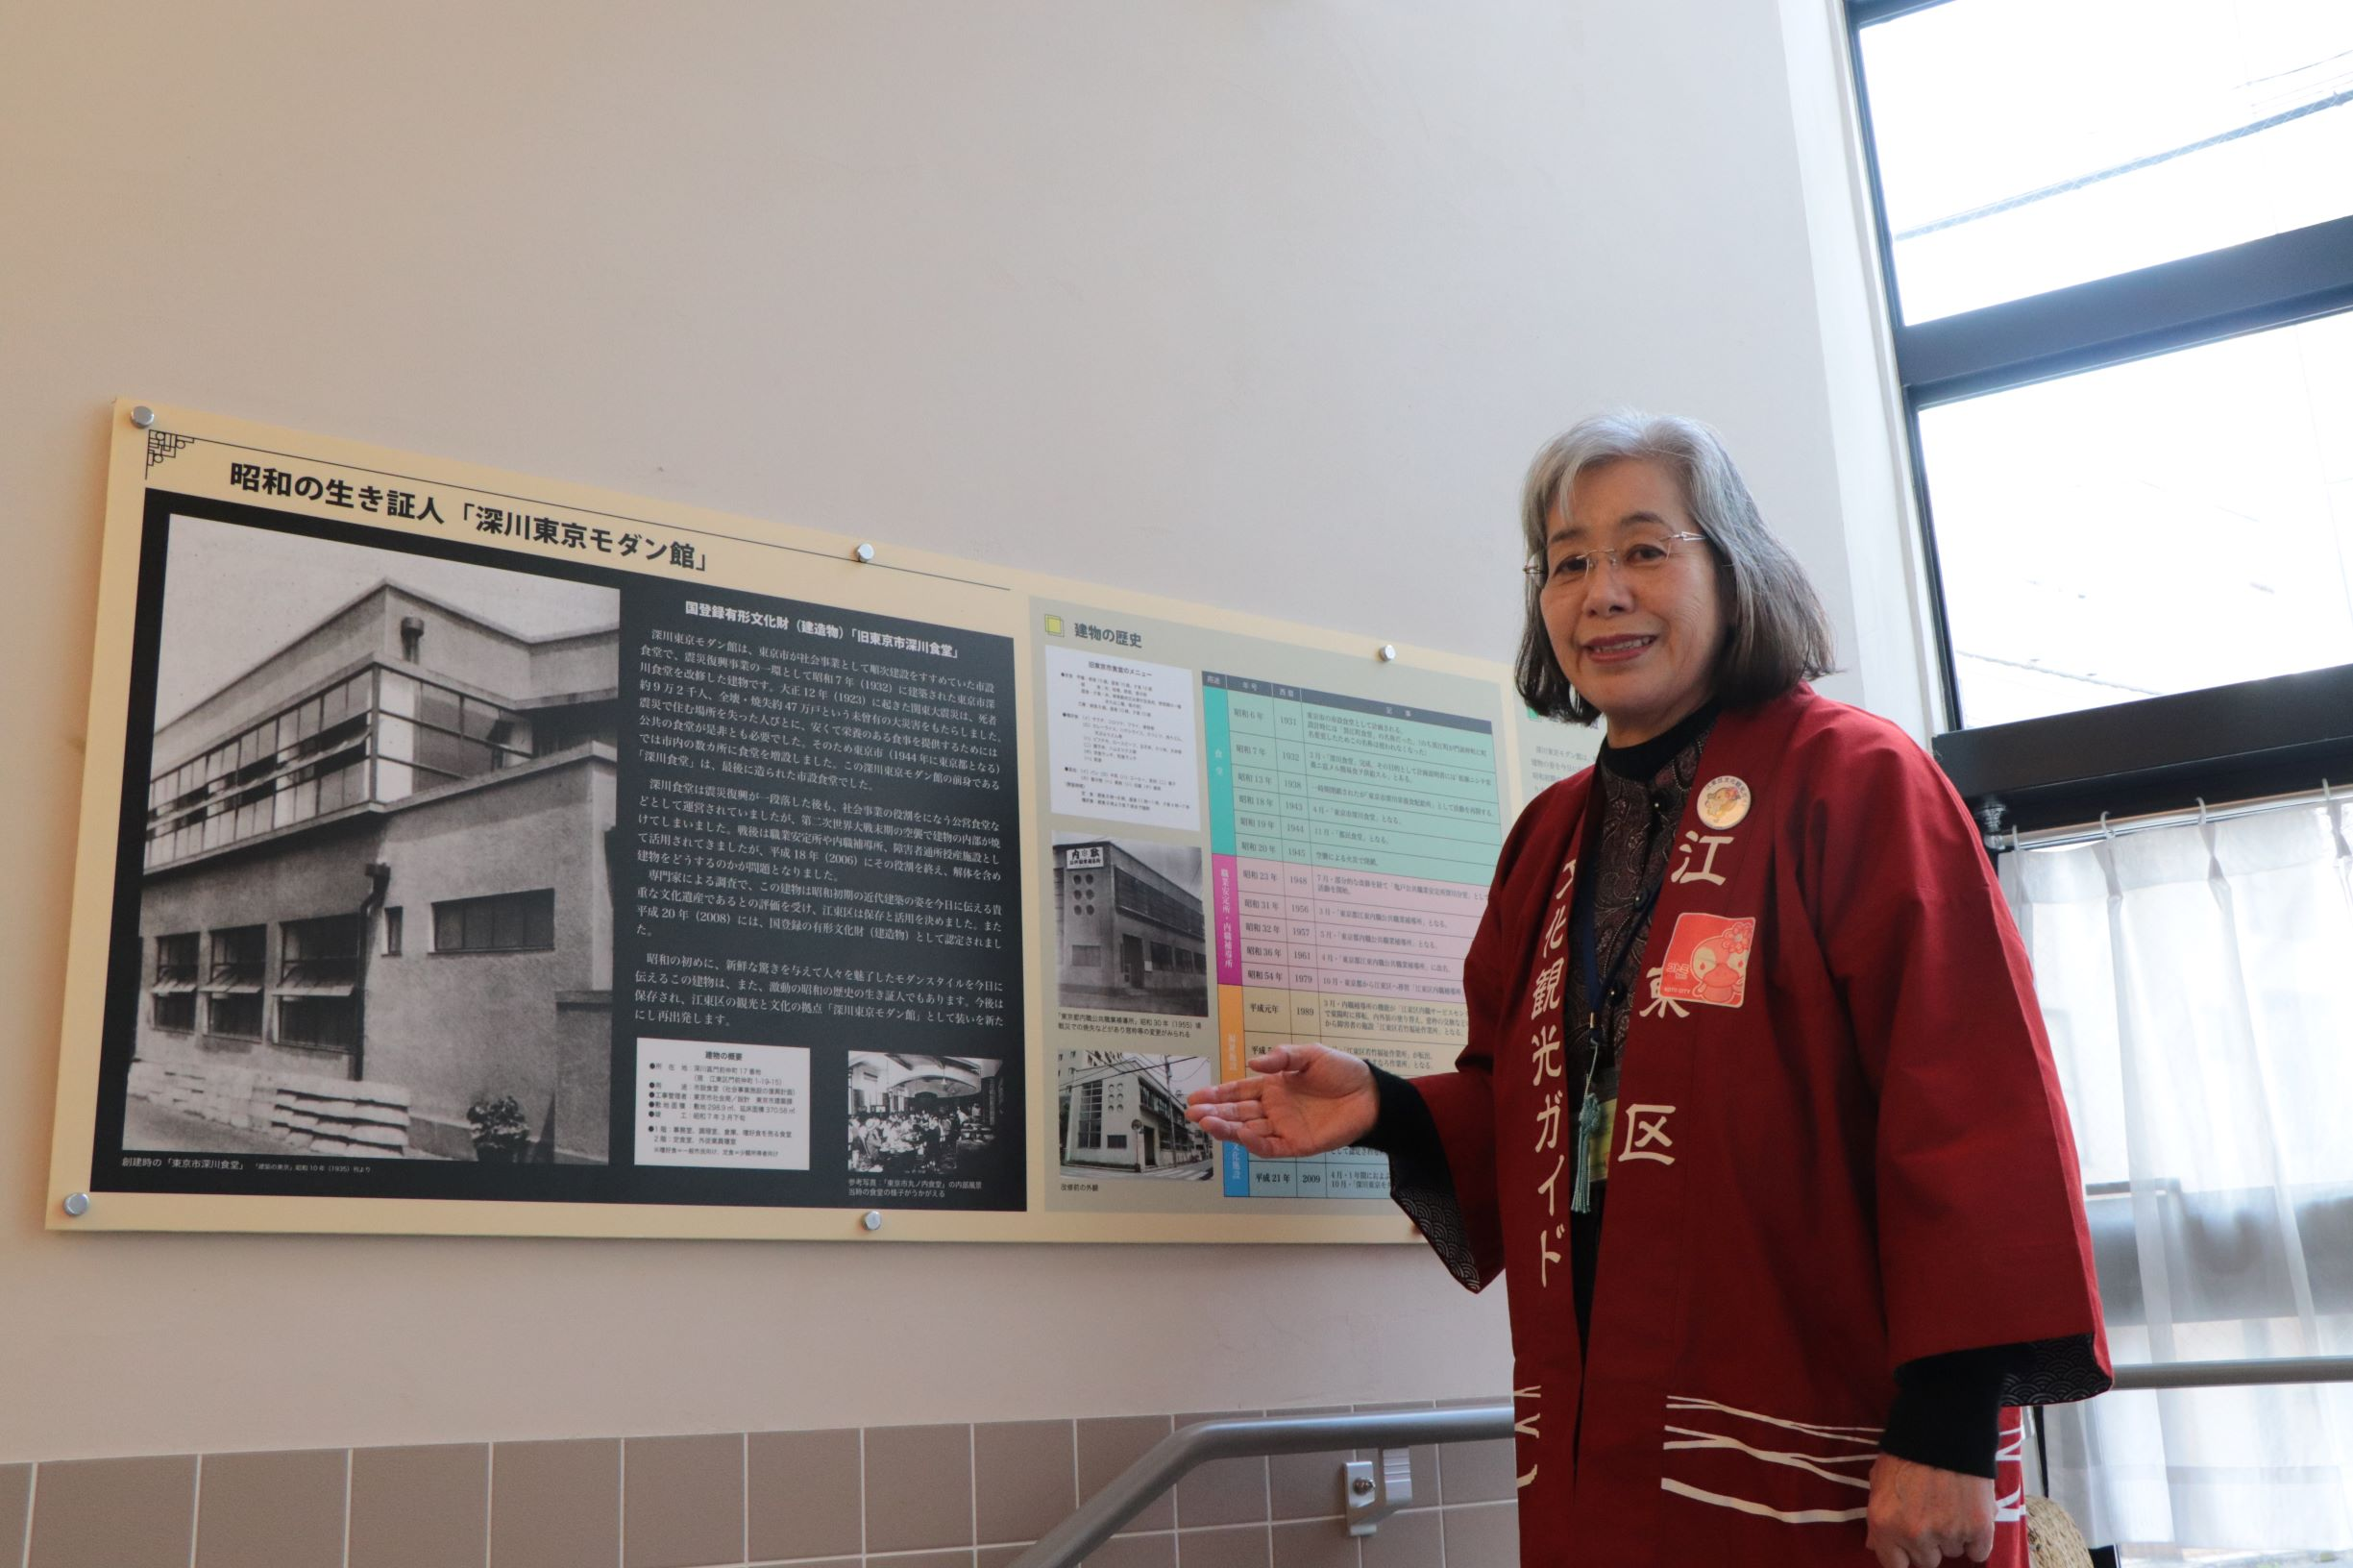 "[Koto Who's who in Koto-ku] Iwabuchi who explains history of sightseeing base ""Fukagawa Tokyo Modern Museum"" in meeting's chairperson Kazue Iwabuchi Nakacho, Monzen, Koto-ku of Koto City culture tour guide."